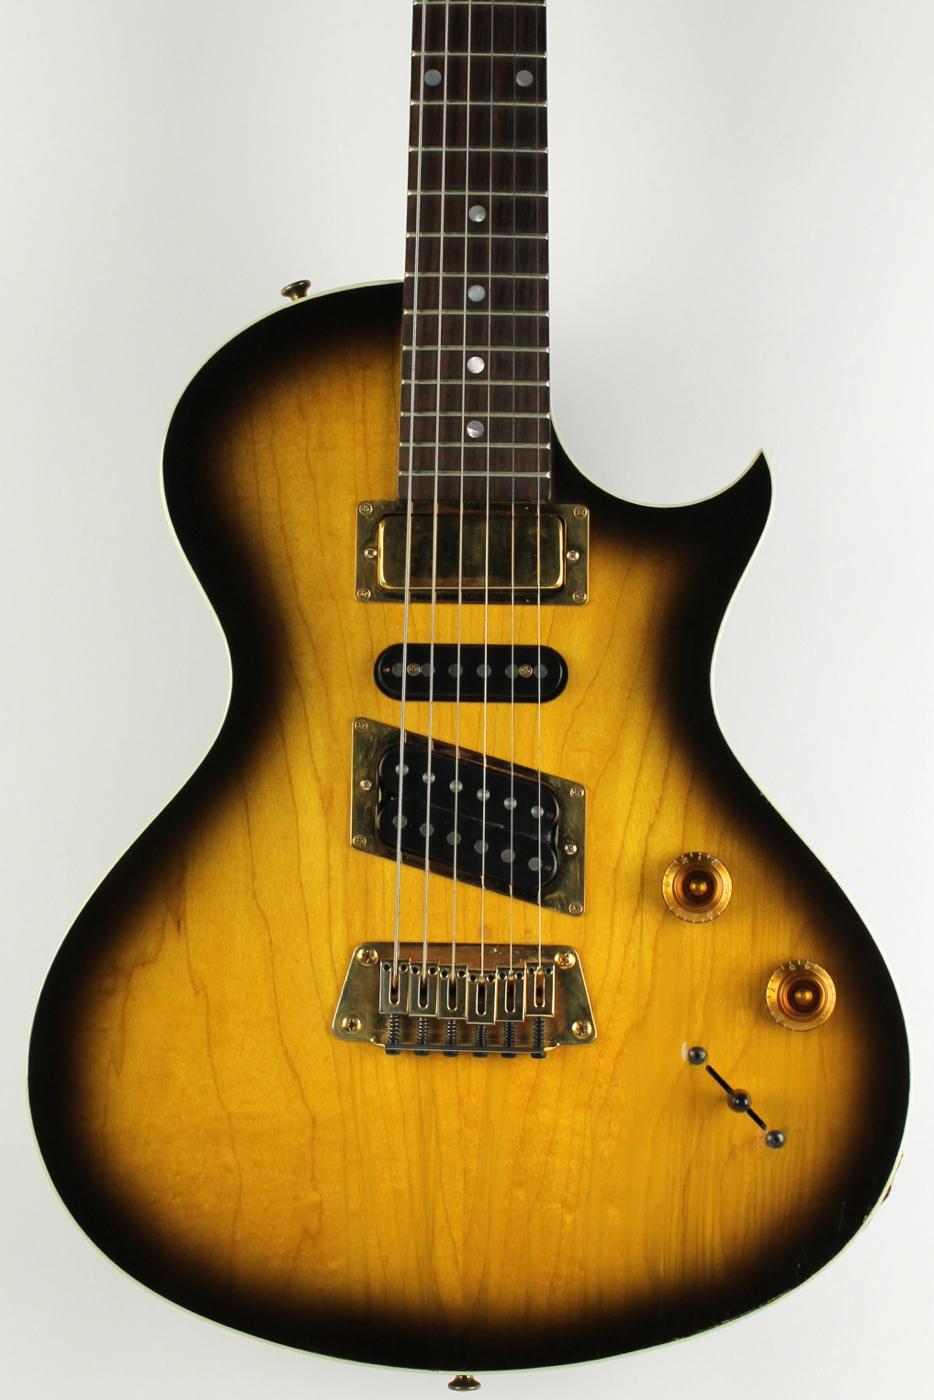 gibson nighthawk 1998 sunburst guitar for sale thunder road guitars. Black Bedroom Furniture Sets. Home Design Ideas